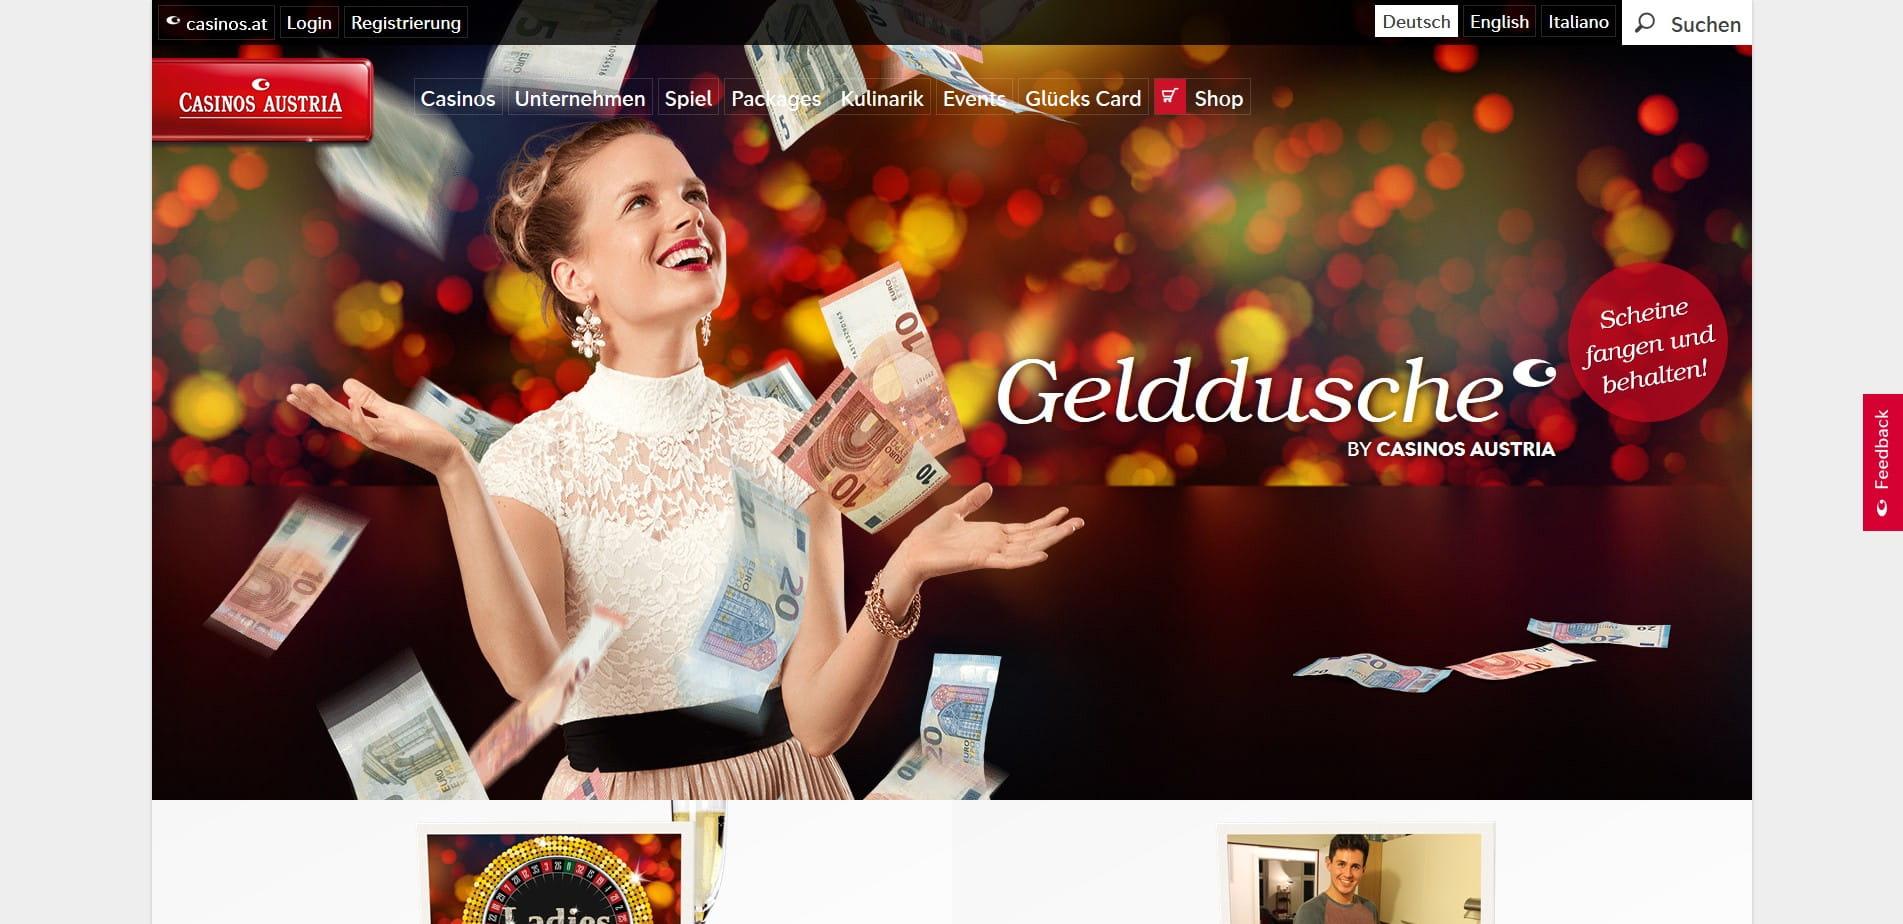 Casino Austria Roulette